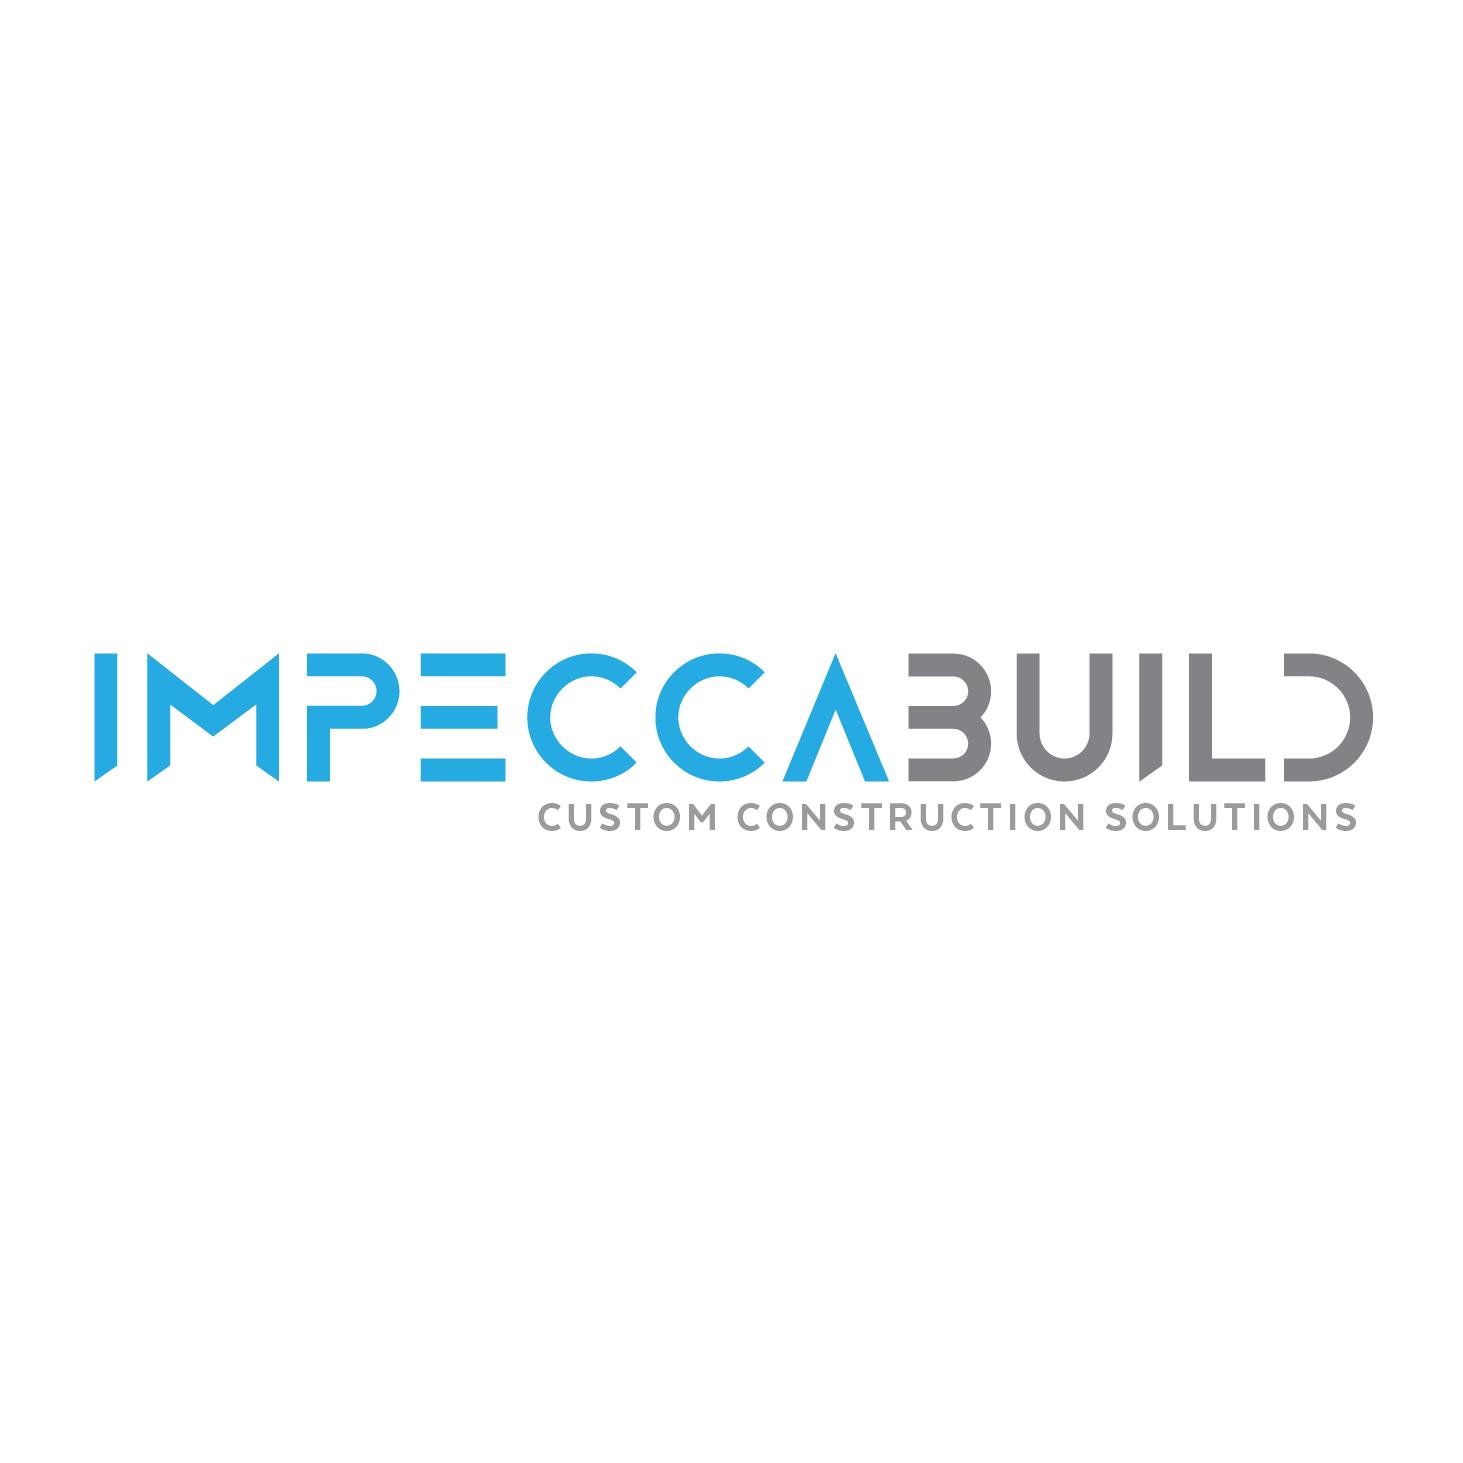 ImpeccaBuild Pty Ltd - Sydney, NSW 2220 - 1300 538 728 | ShowMeLocal.com